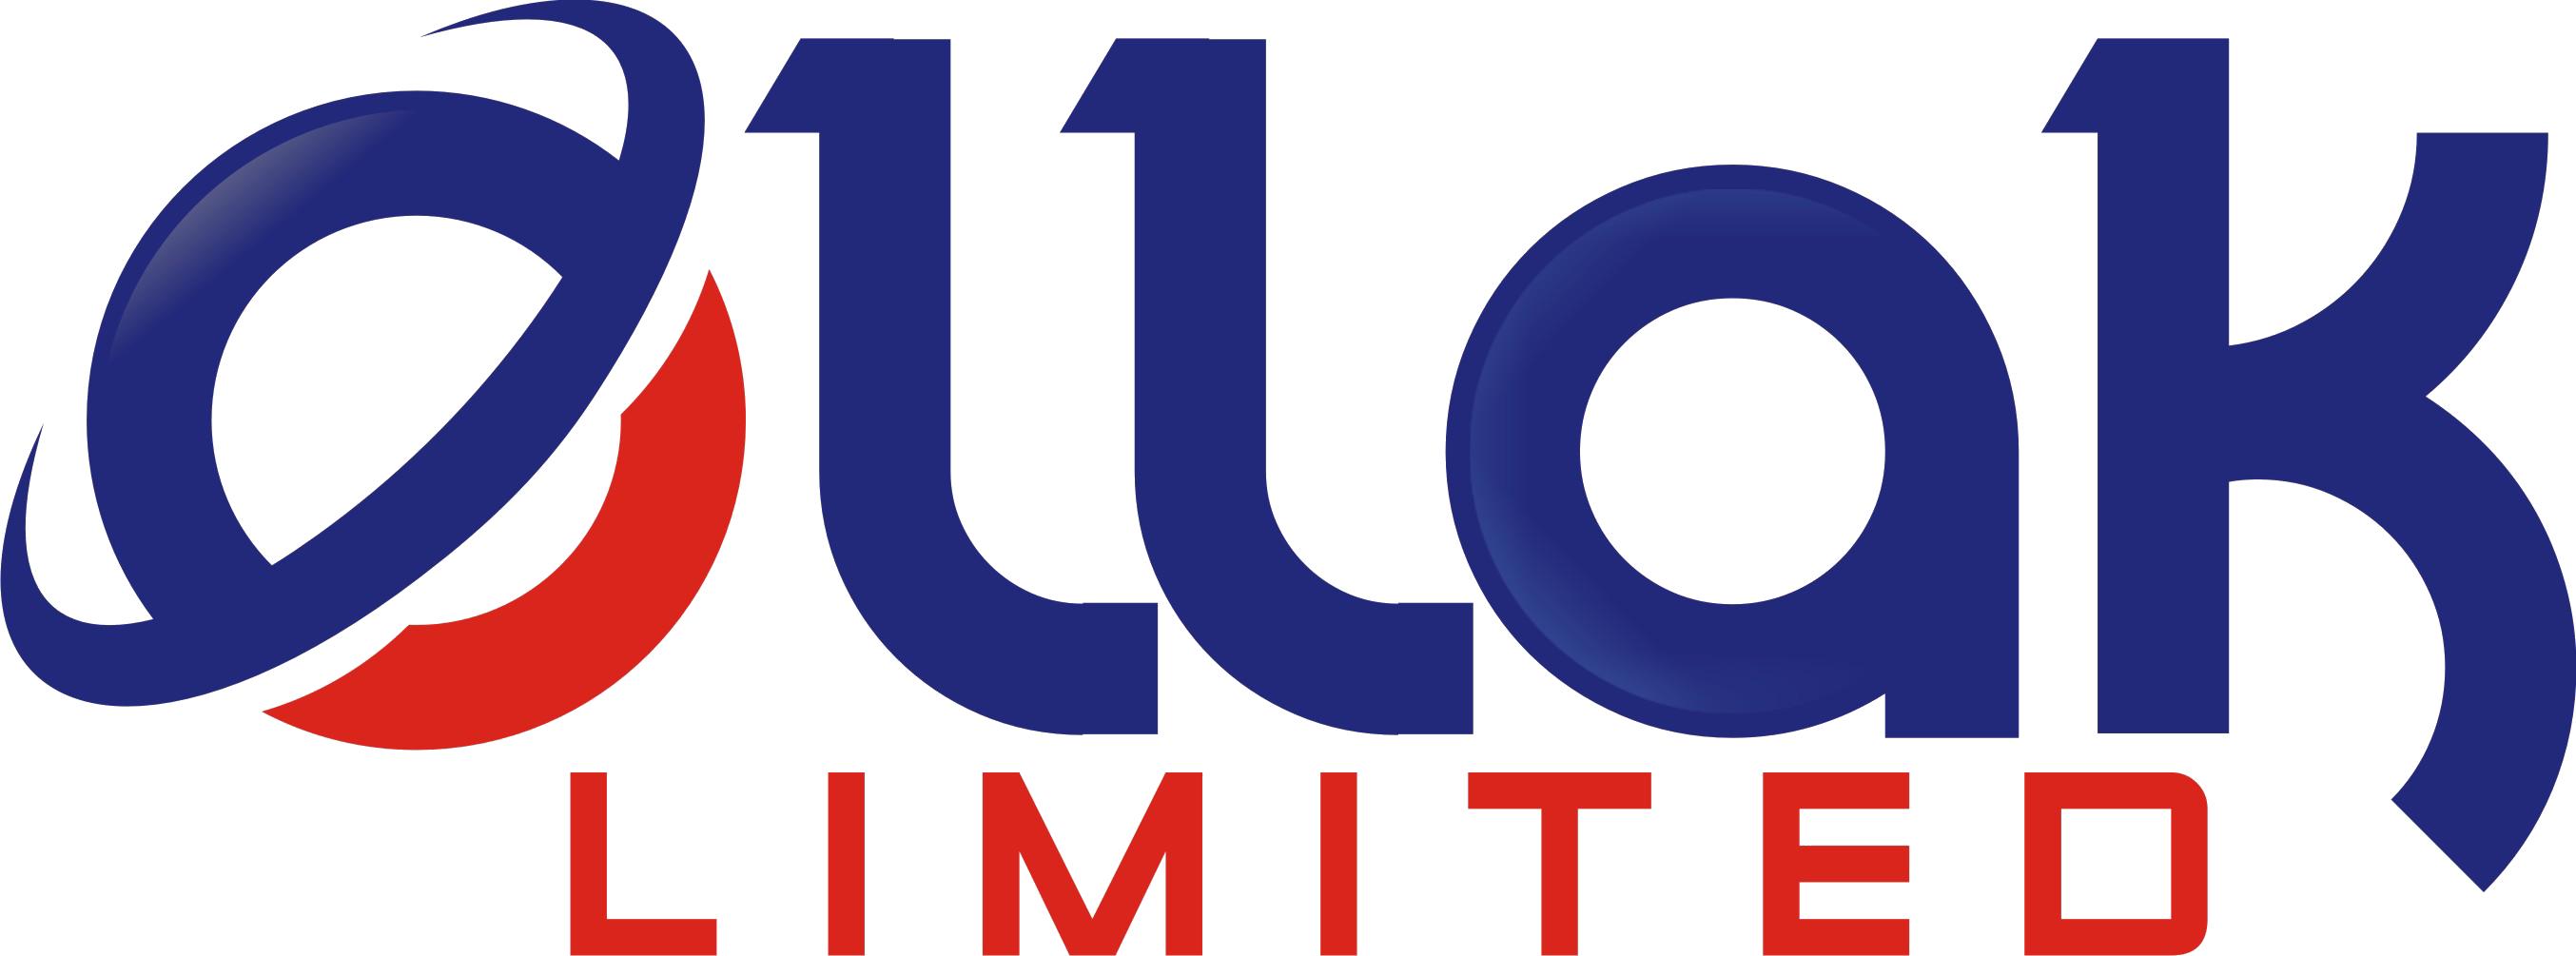 Ollak Limited